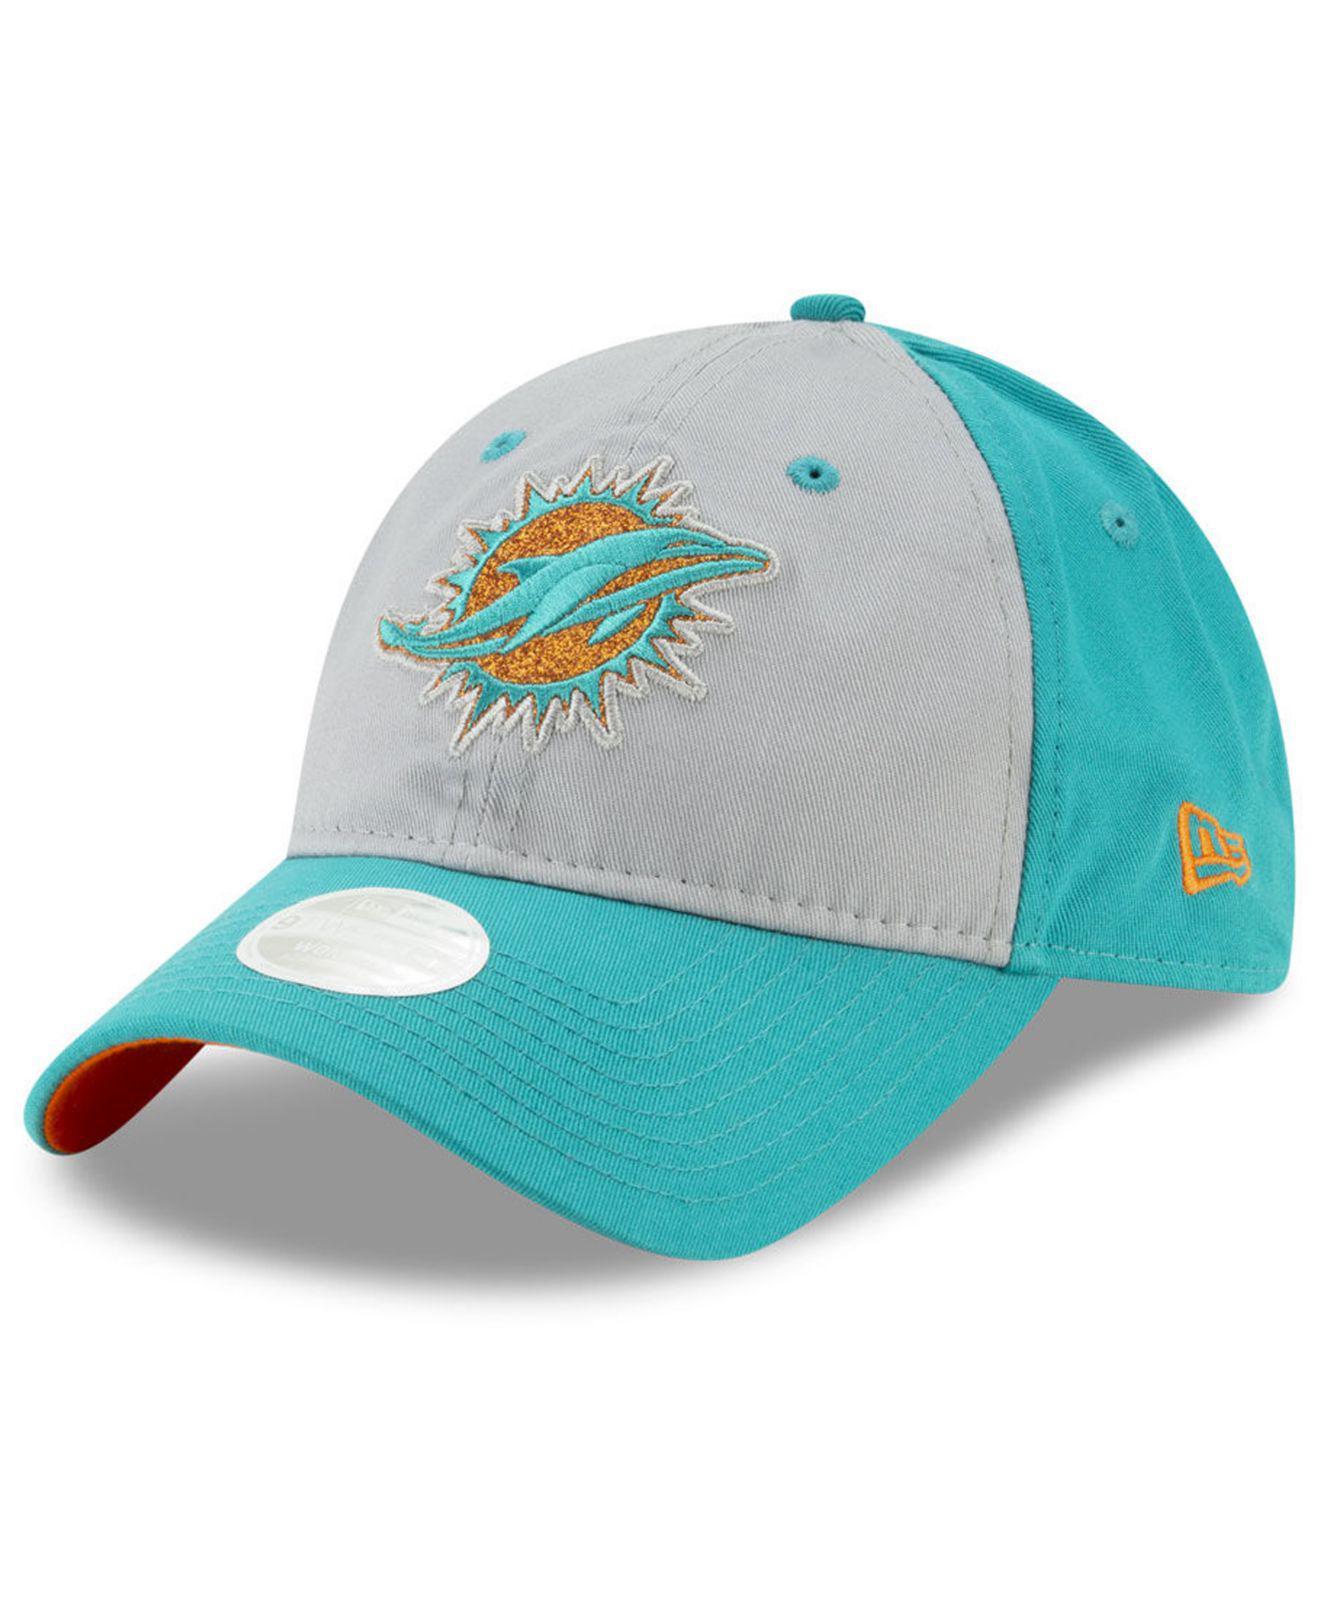 wholesale dealer 80074 97662 ... Miami Dolphins Gray Glitter 9twenty Cap - Lyst. View fullscreen